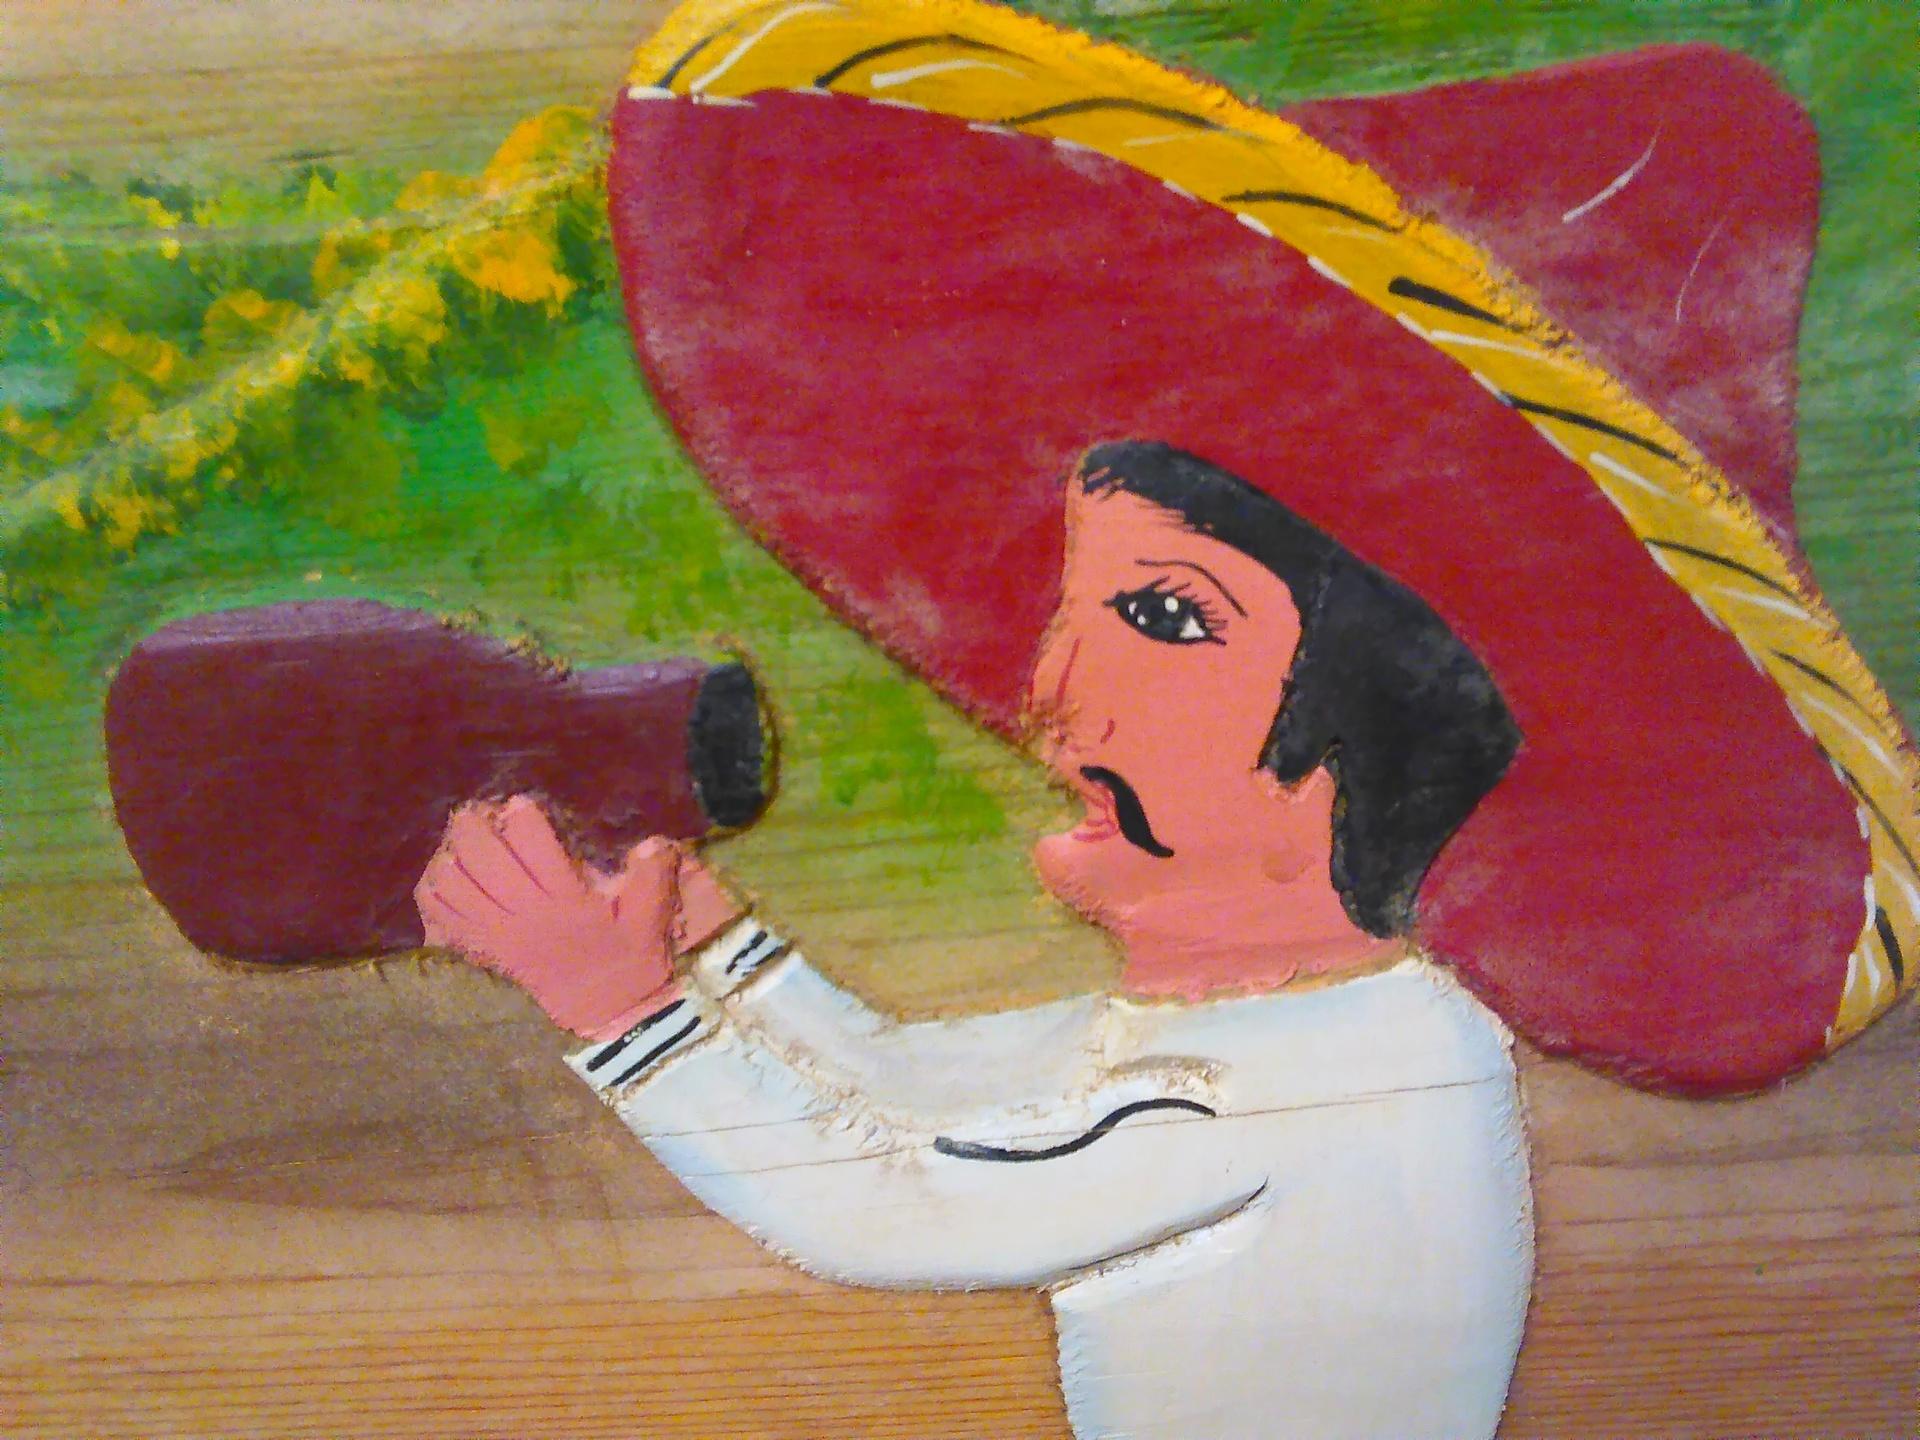 Sombrero man 2